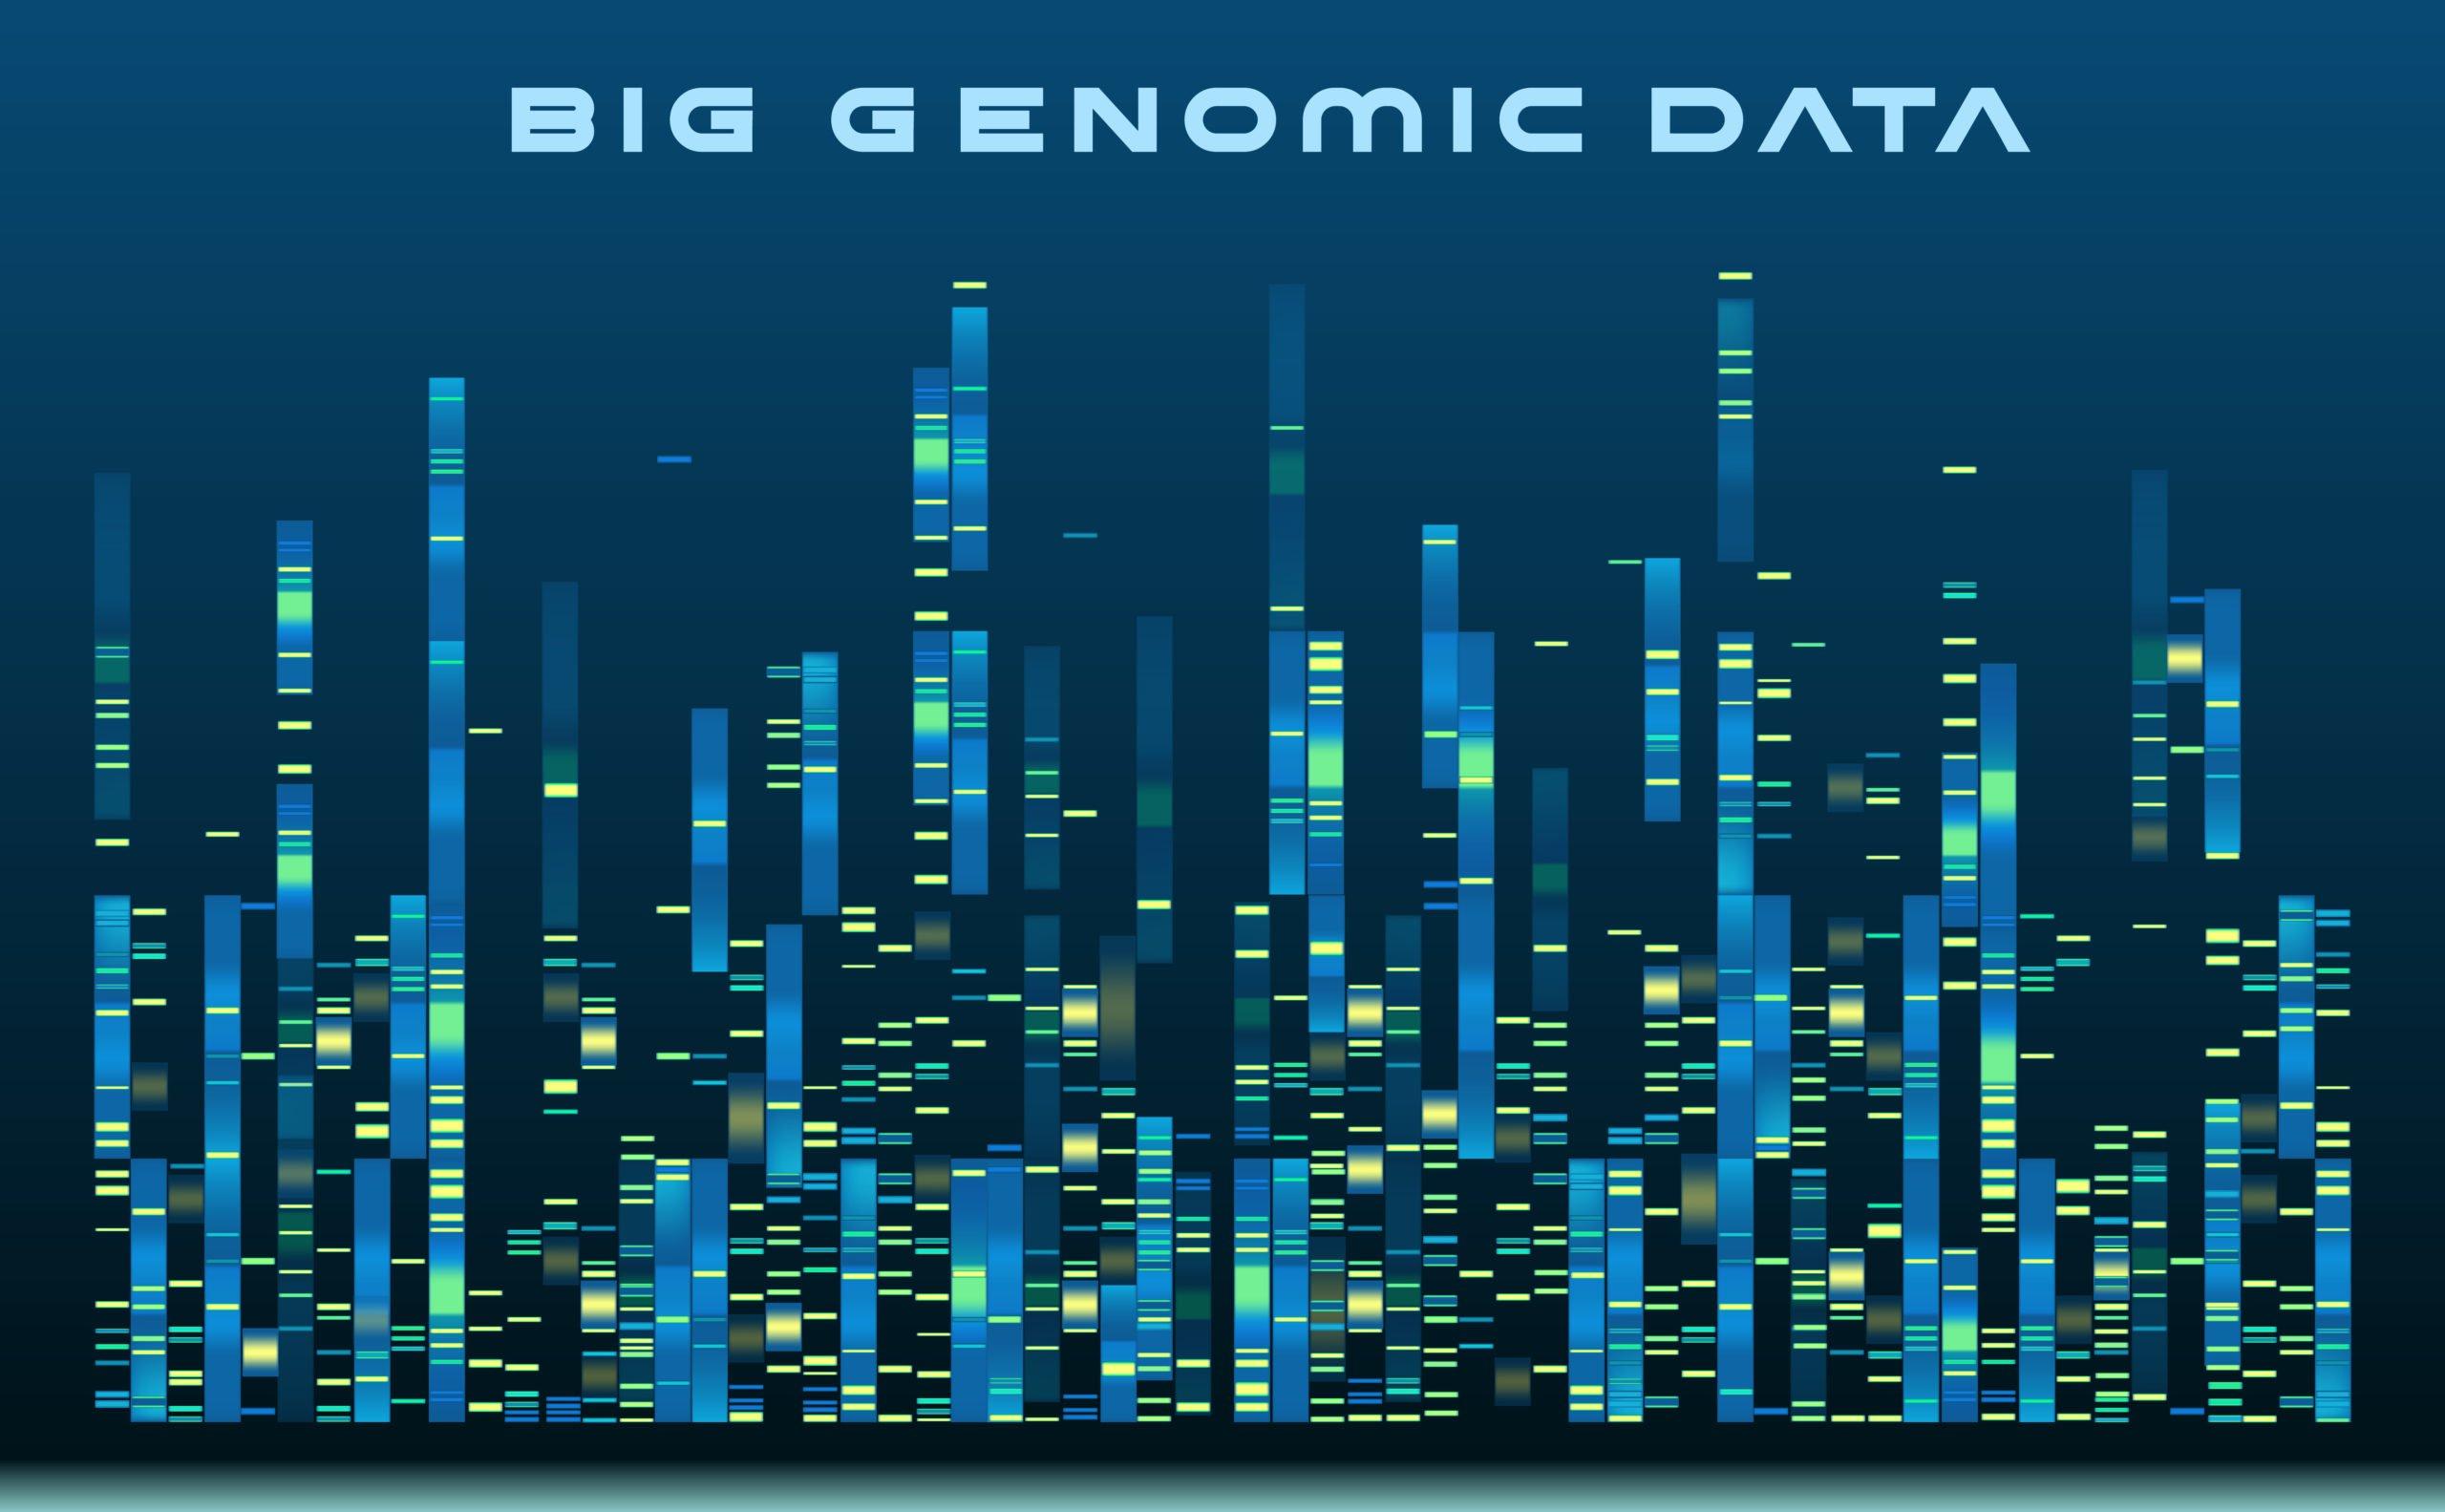 Big Genomic Data image